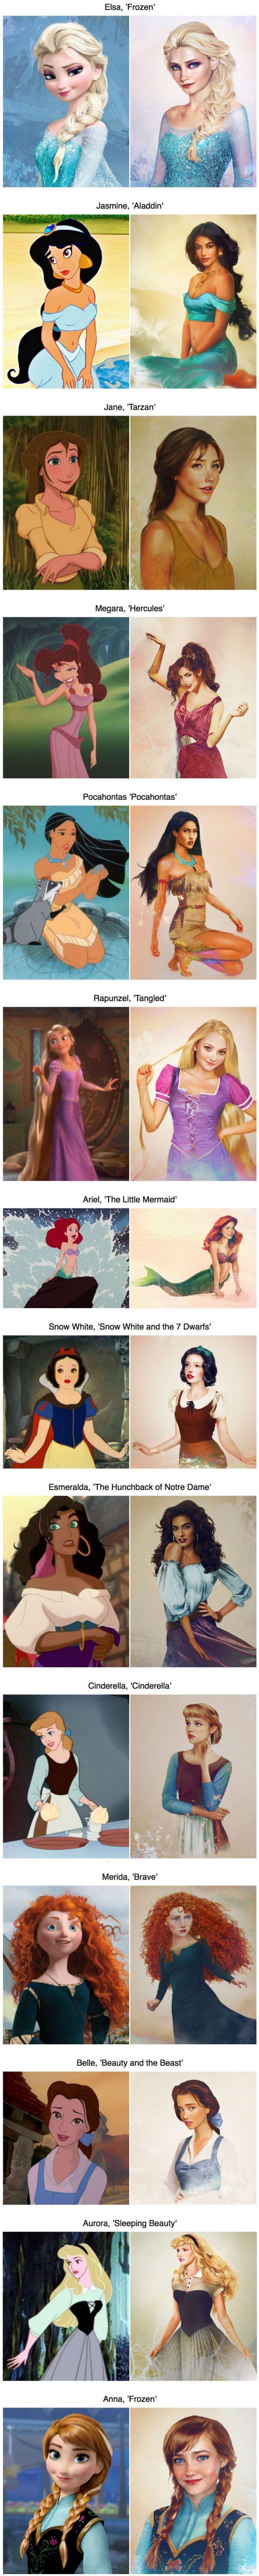 What the real Disney princesses looked like (By Jirka Väätäinen) http://ibeebz.com